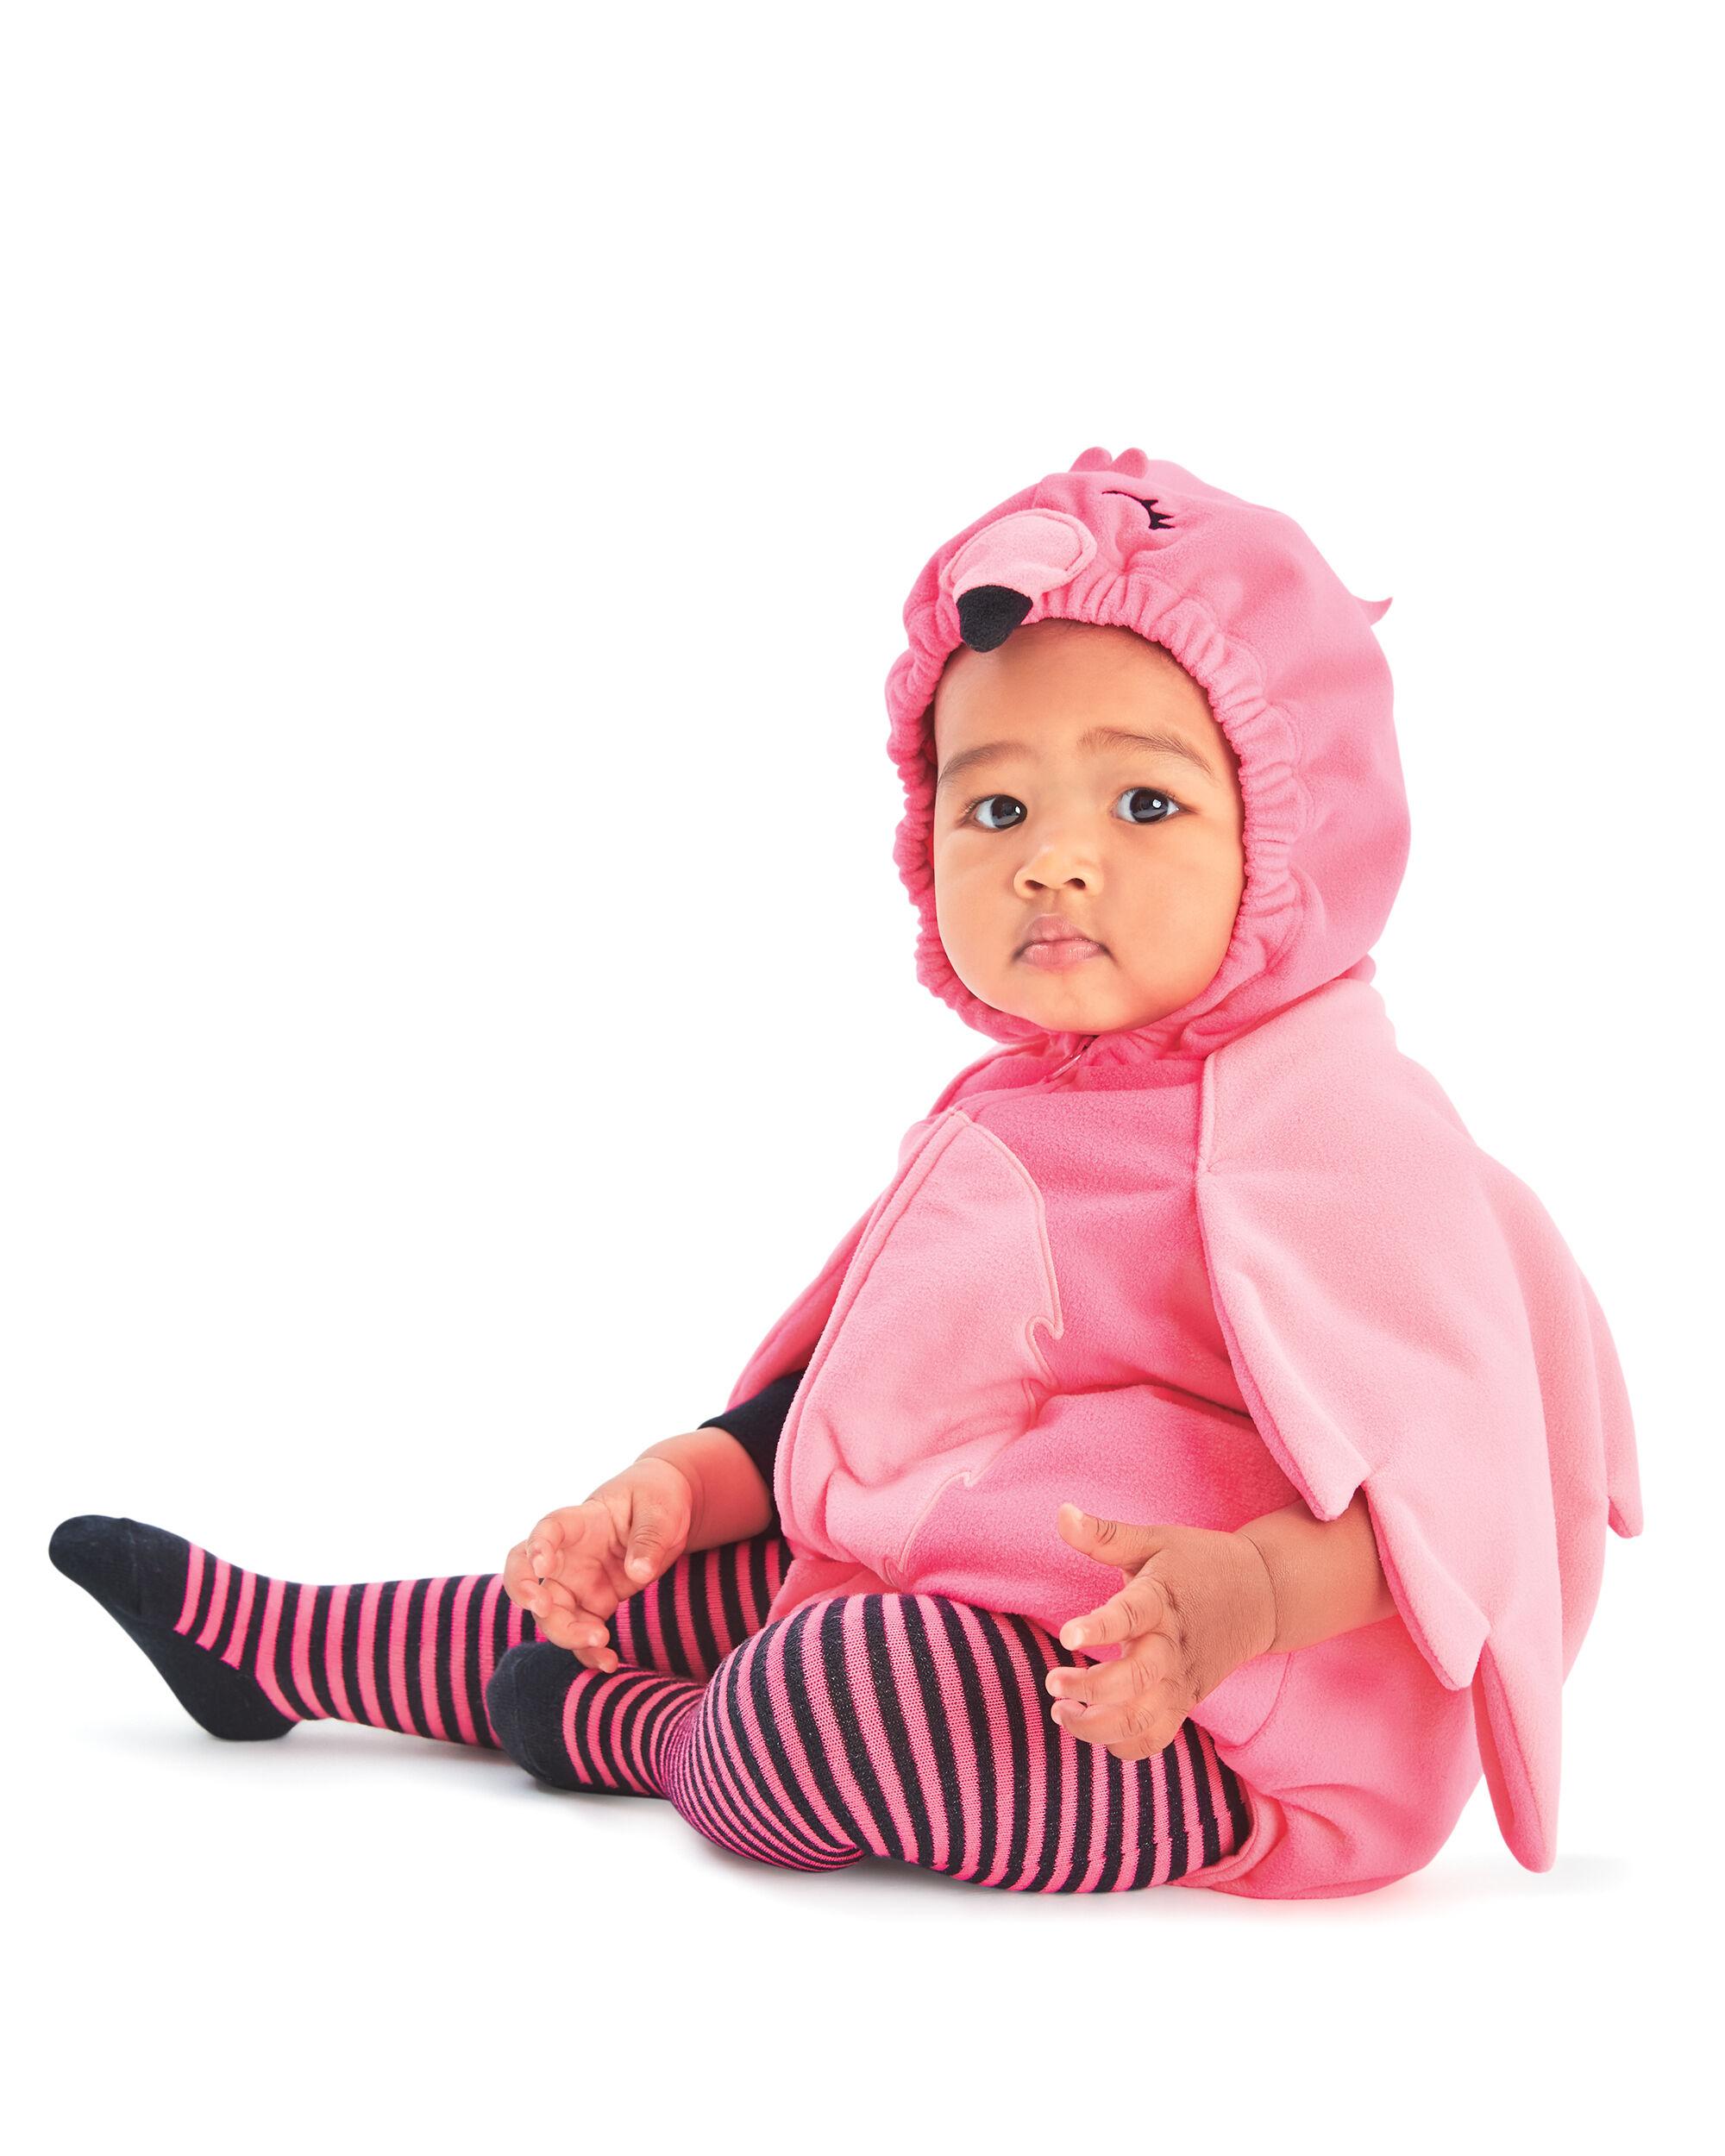 Little Flamingo Halloween Costume ...  sc 1 st  Carteru0027s & Little Flamingo Halloween Costume | Carters.com